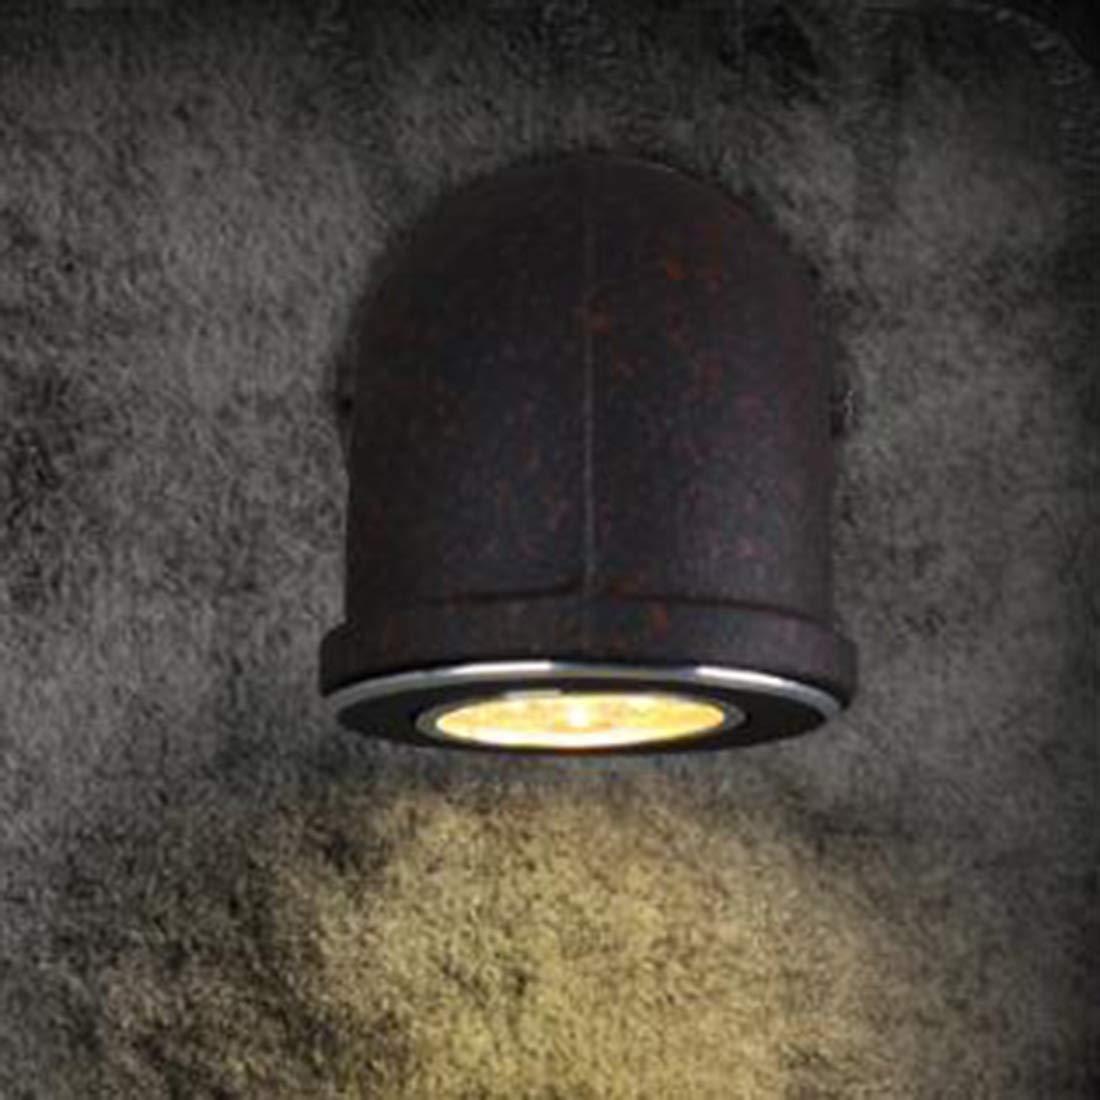 Mkulxina Altmodische LED Wand Lampe Eisenrohr Wand Lampe Wand Lampe Wandleuchte